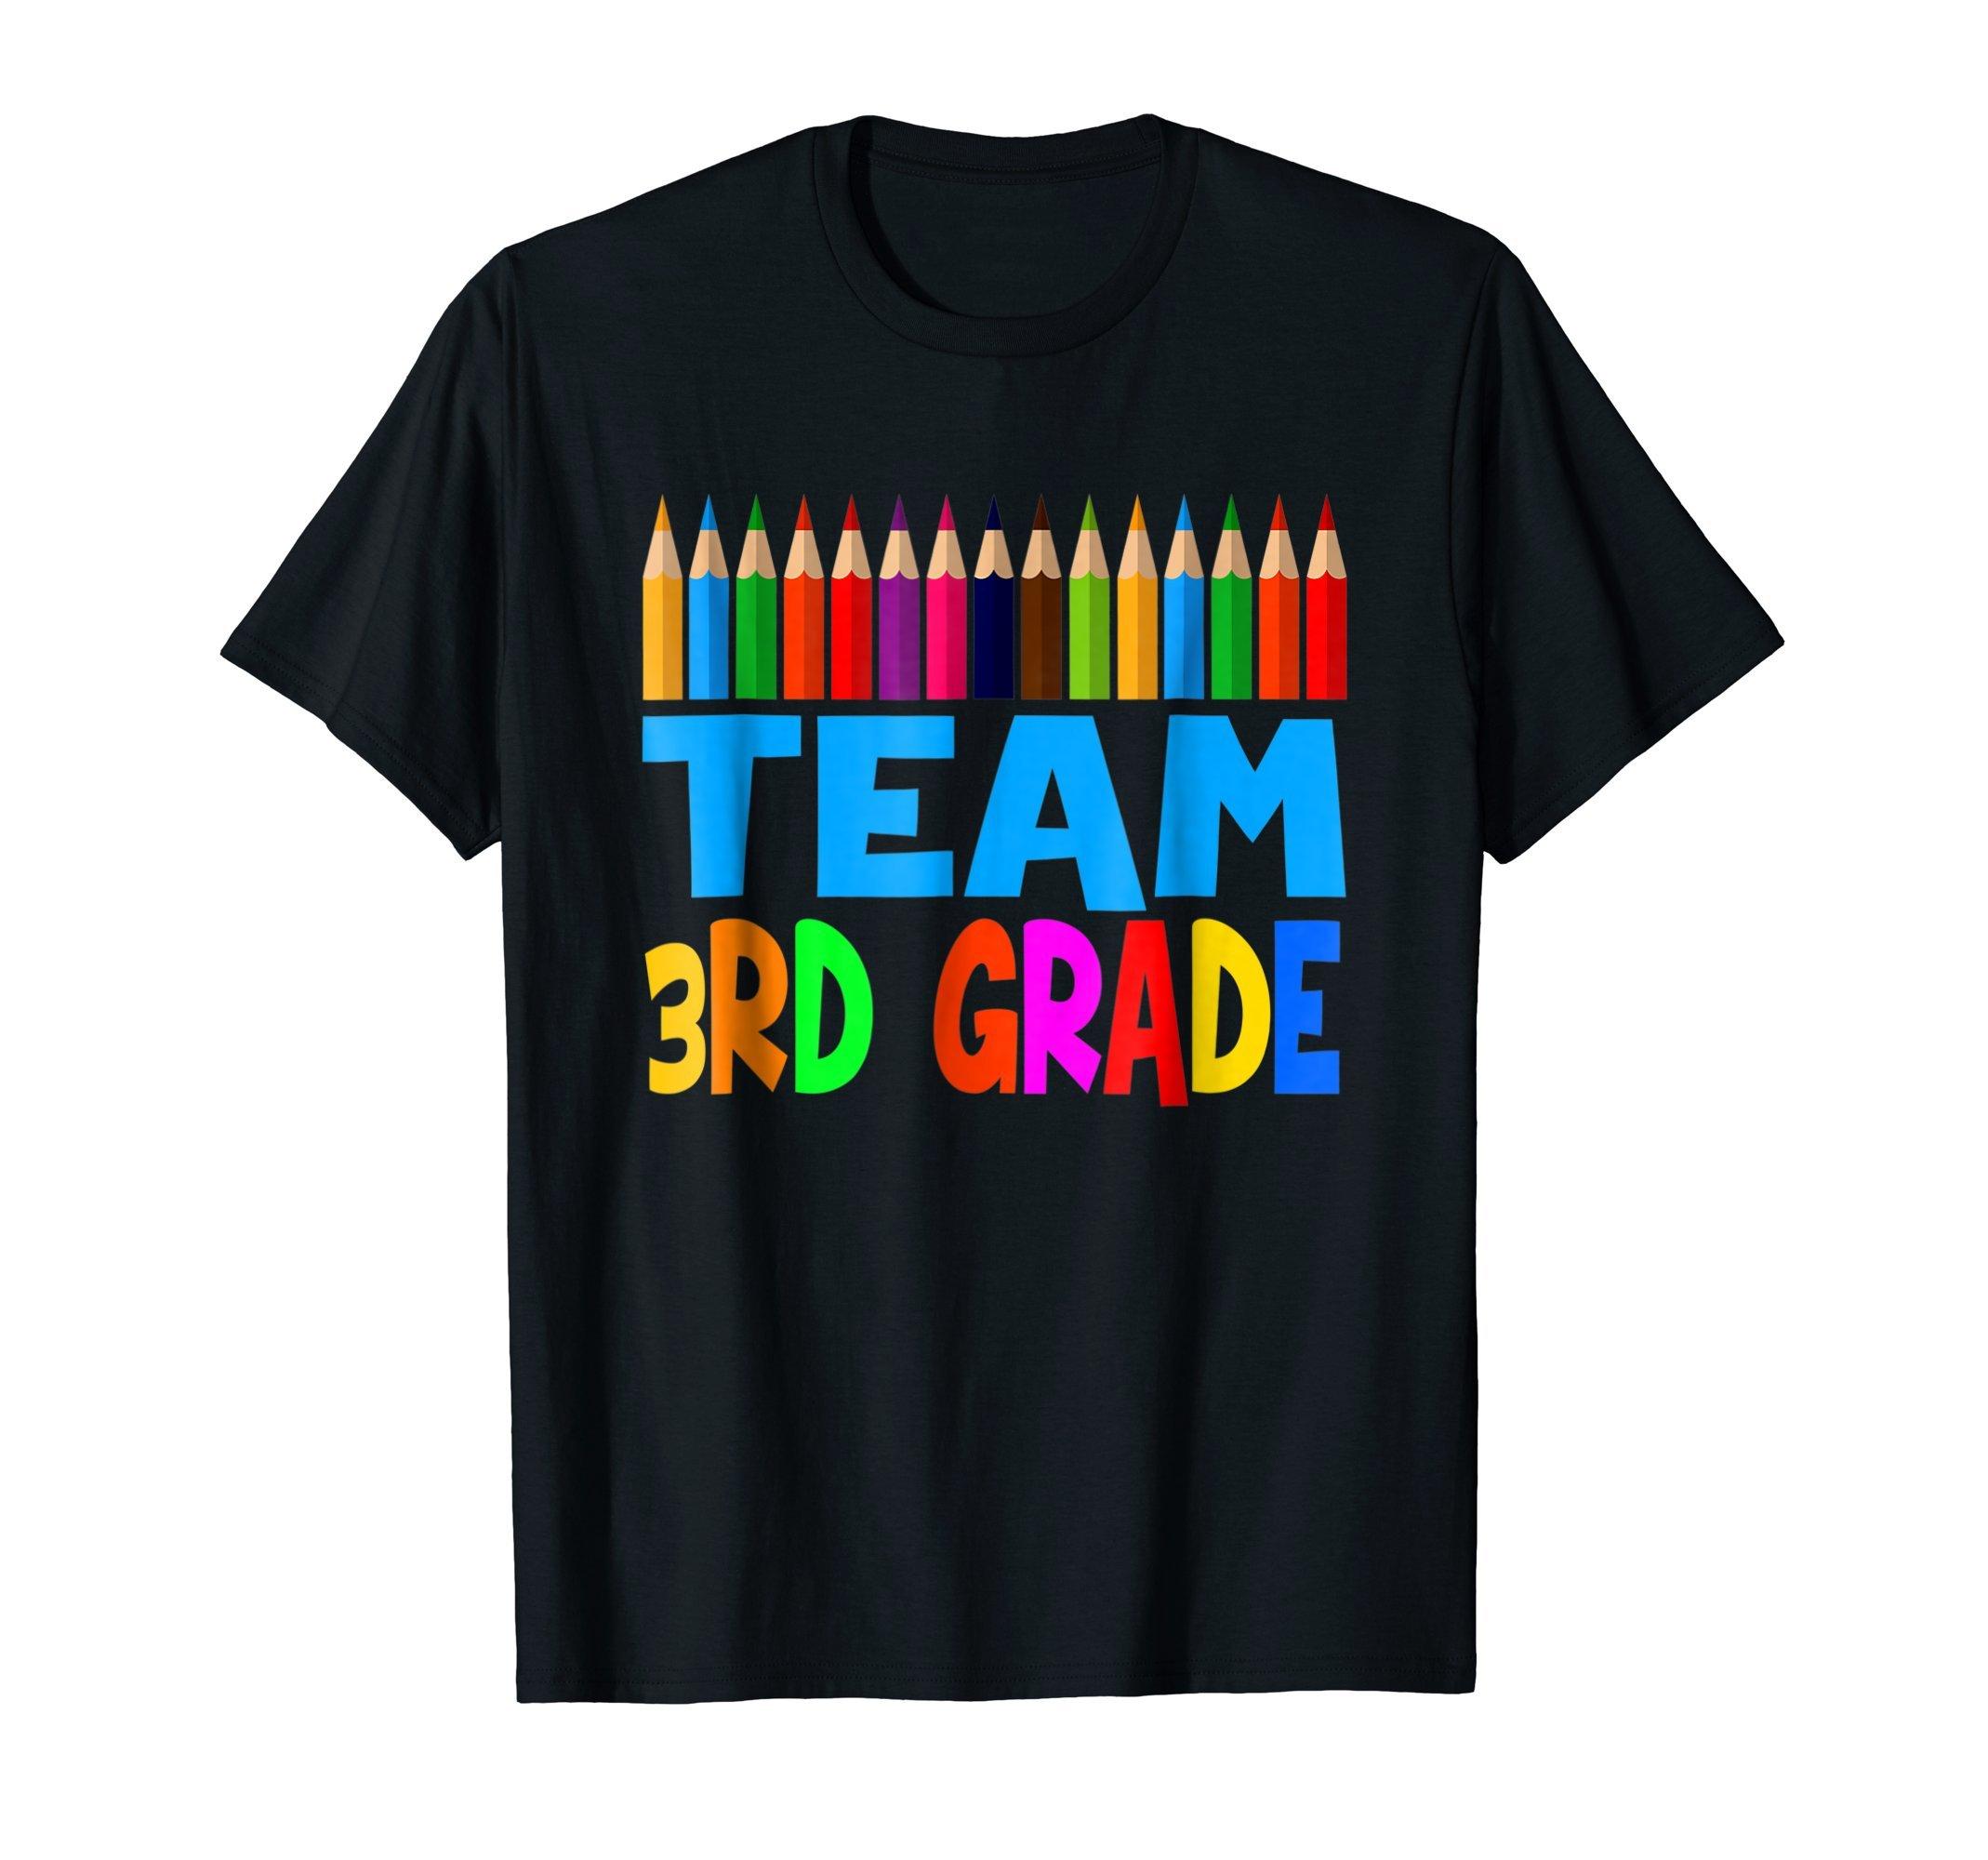 3rd Grade Team Pencils Tshirts 3rd Grade For Kids / Teachers